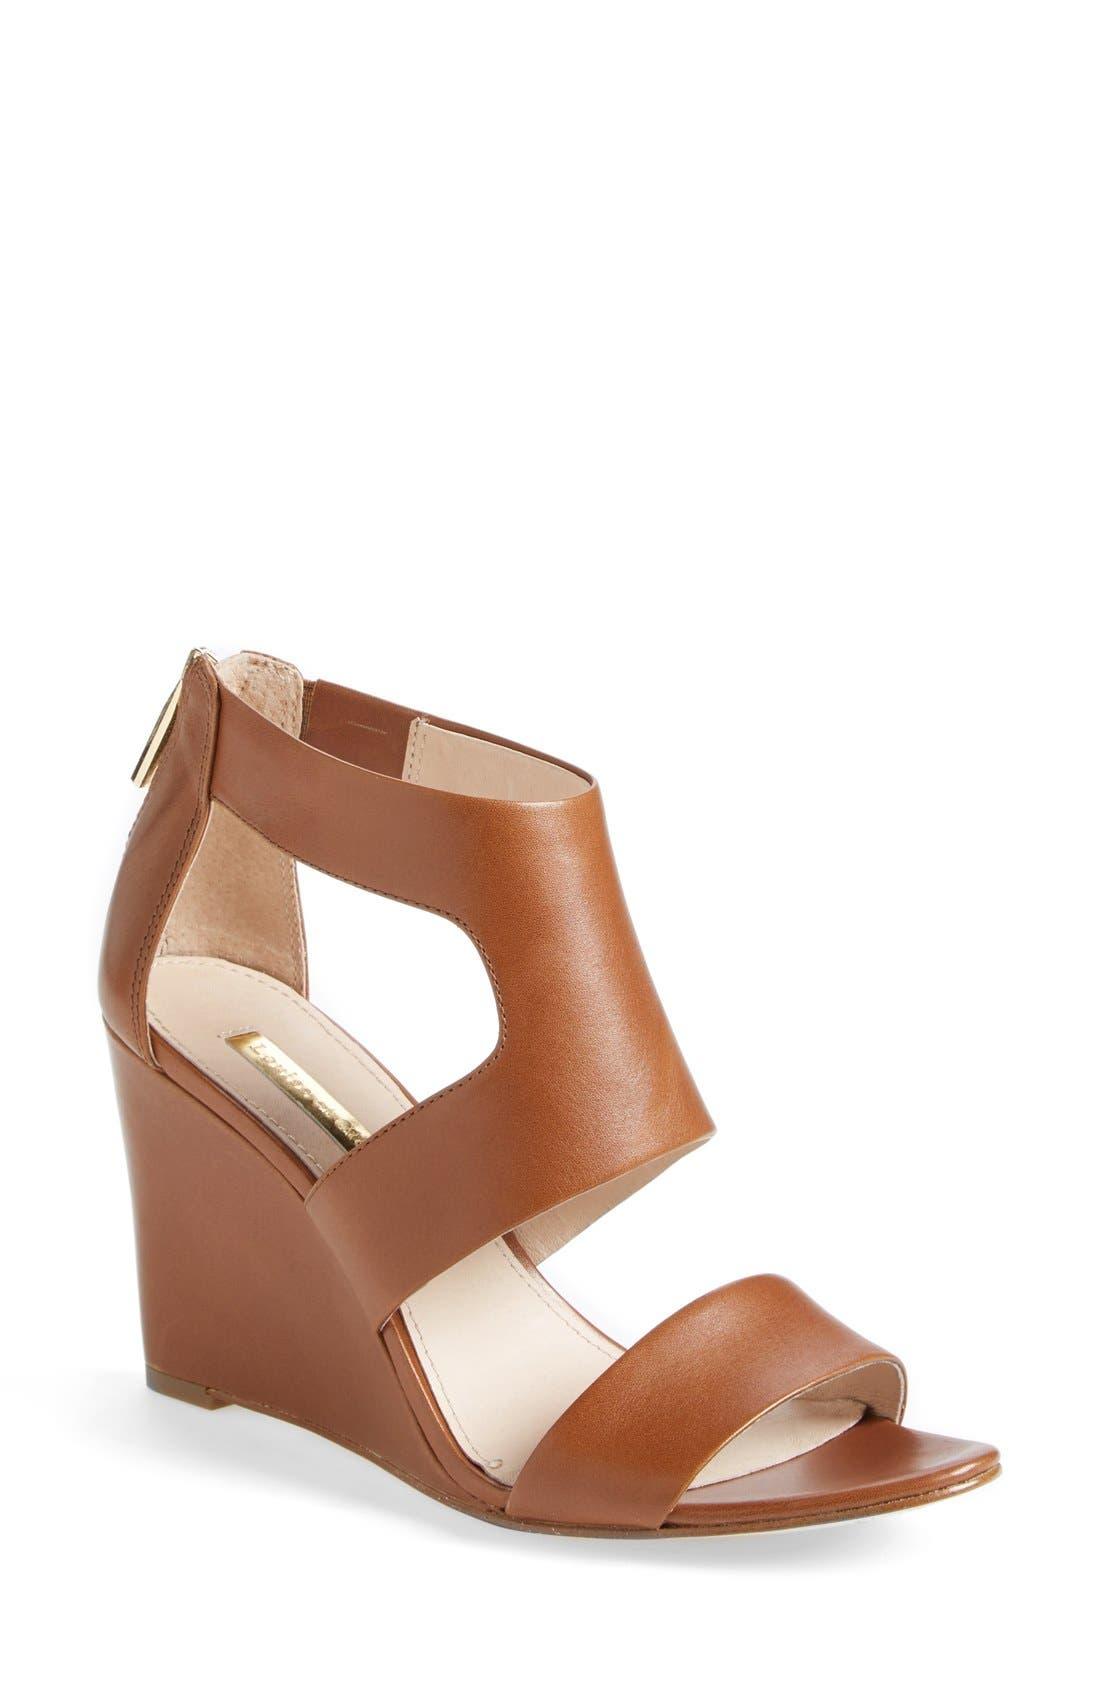 Main Image - Louise et Cie 'Rozza' Leather Wedge Sandal (Women)